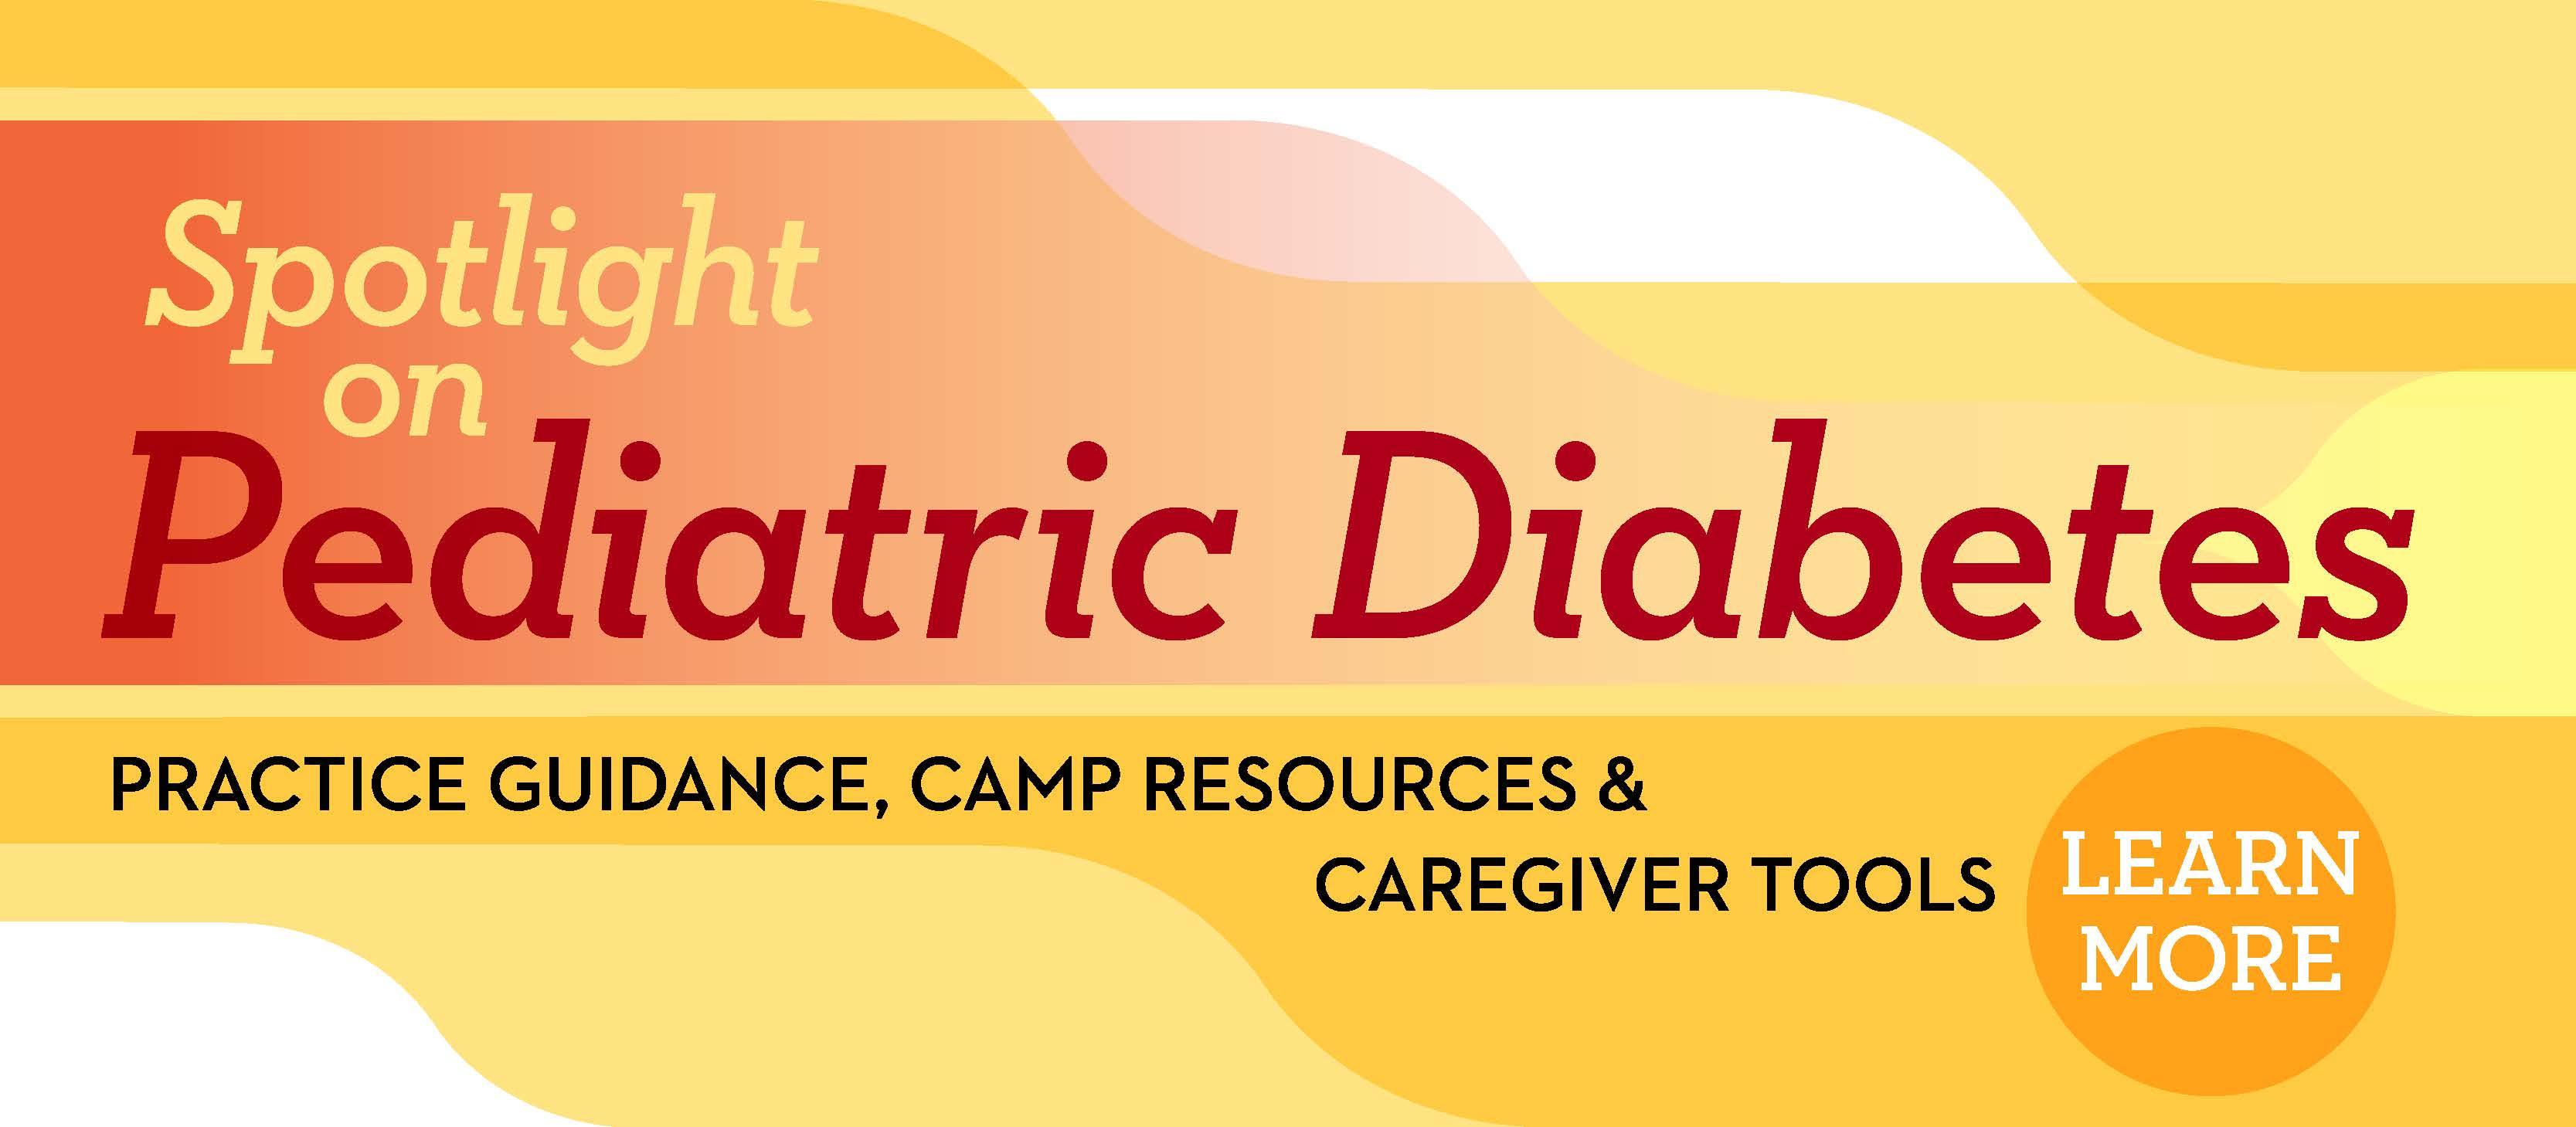 American Association of Diabetes Educators